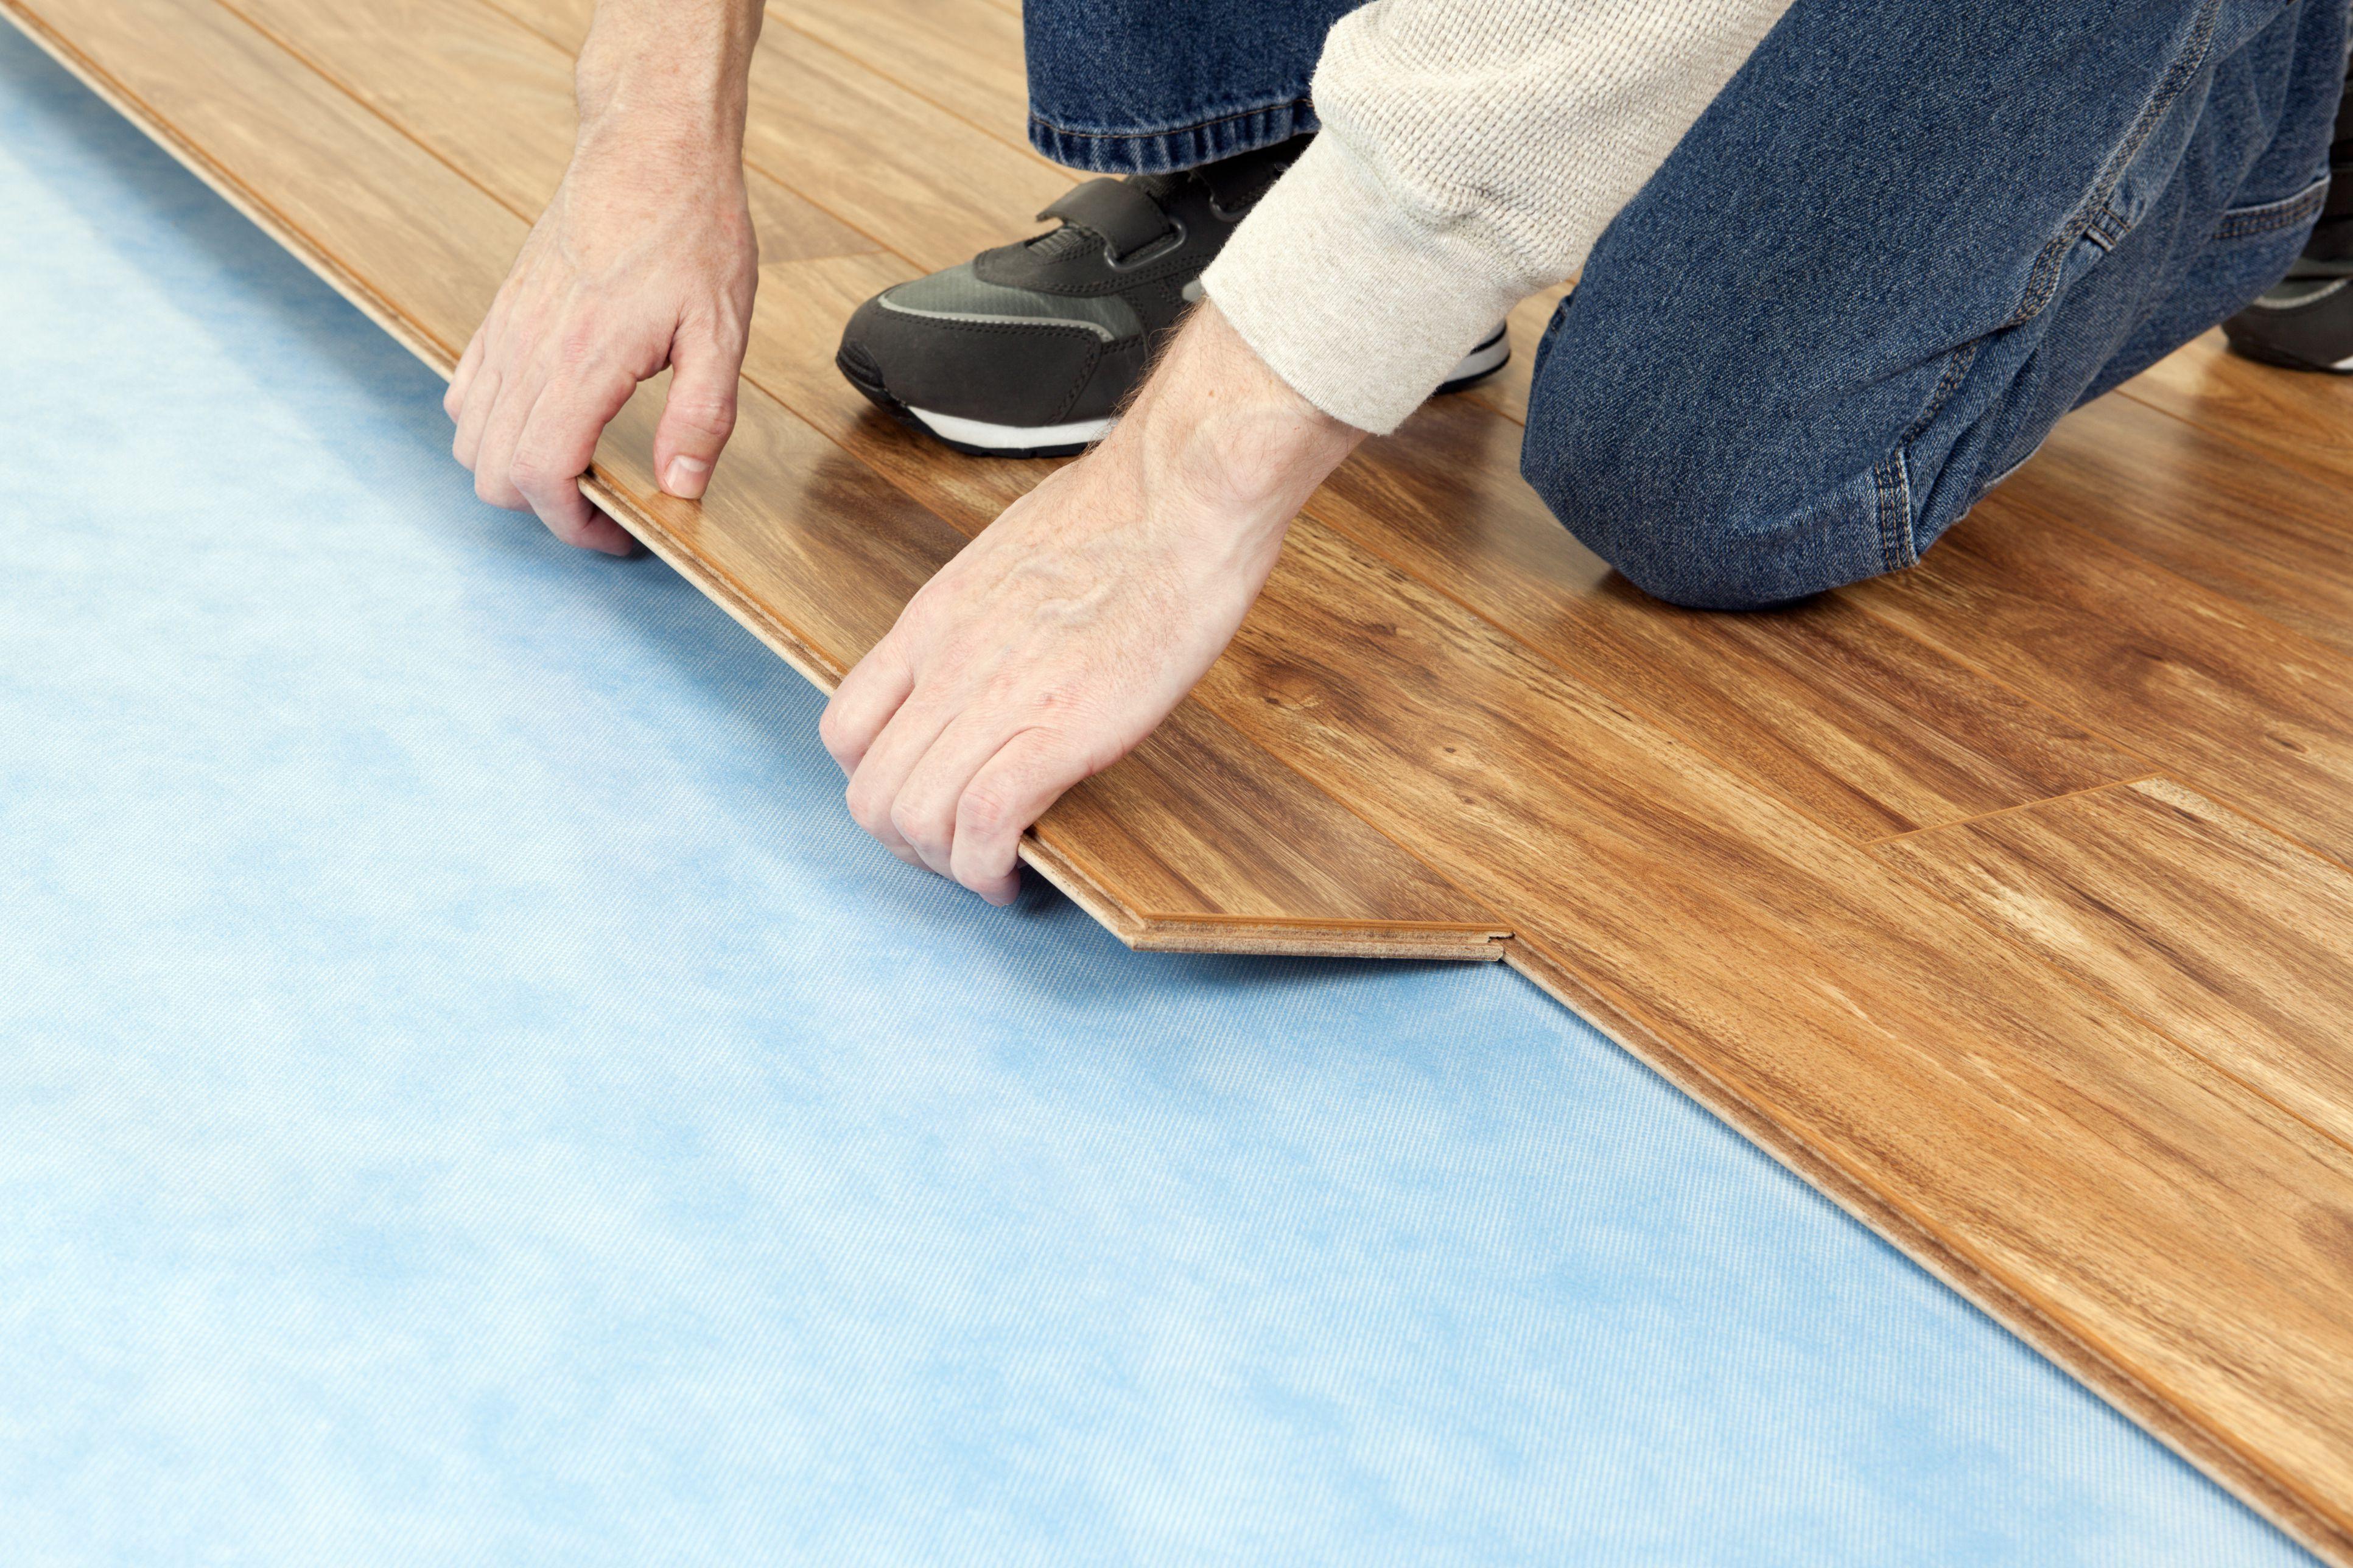 best moisture barrier for hardwood floors of flooring underlayment the basics in new floor installation 185270632 582b722c3df78c6f6af0a8ab